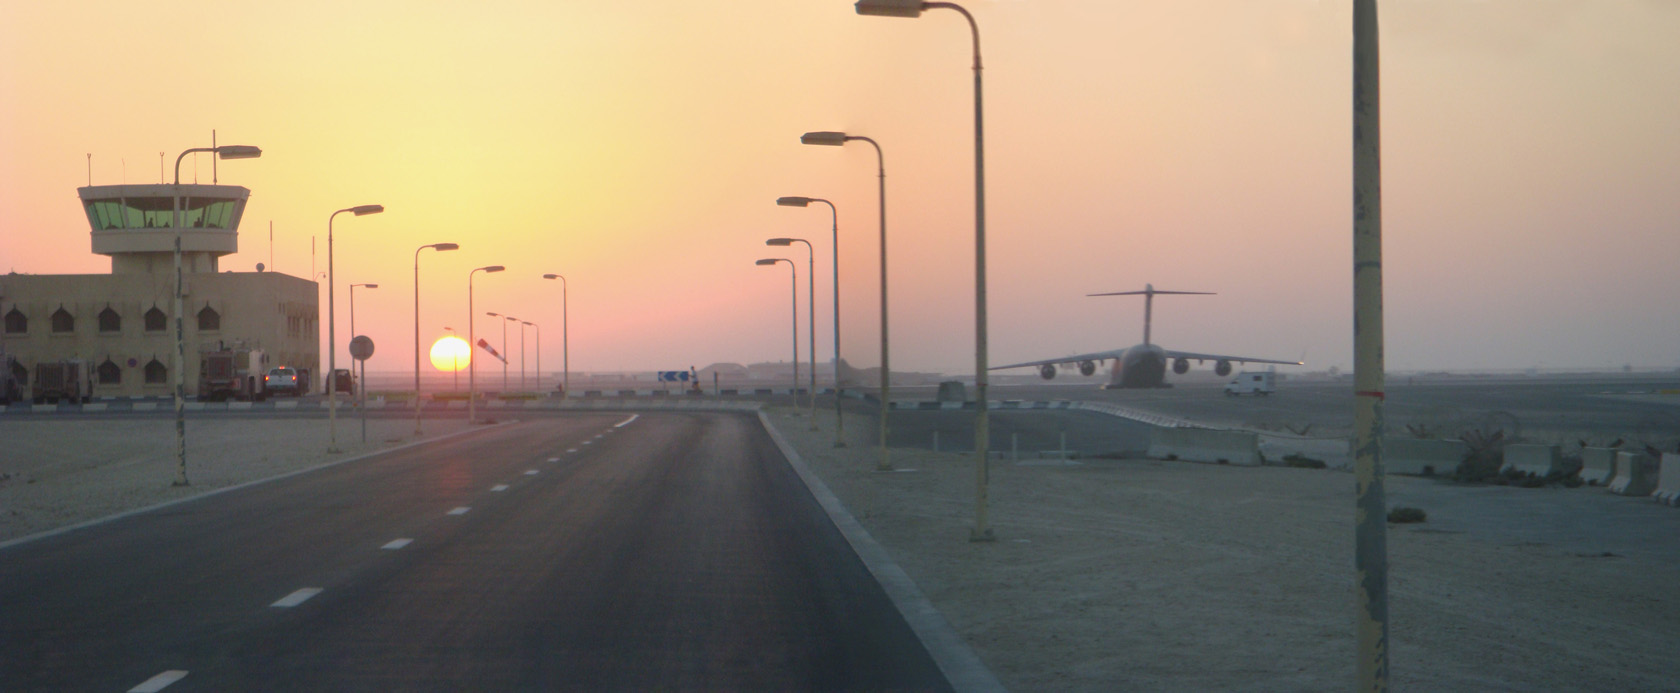 A couple photos from my Deployment (thus far)-al-udeid-panoramic-smaller.jpg